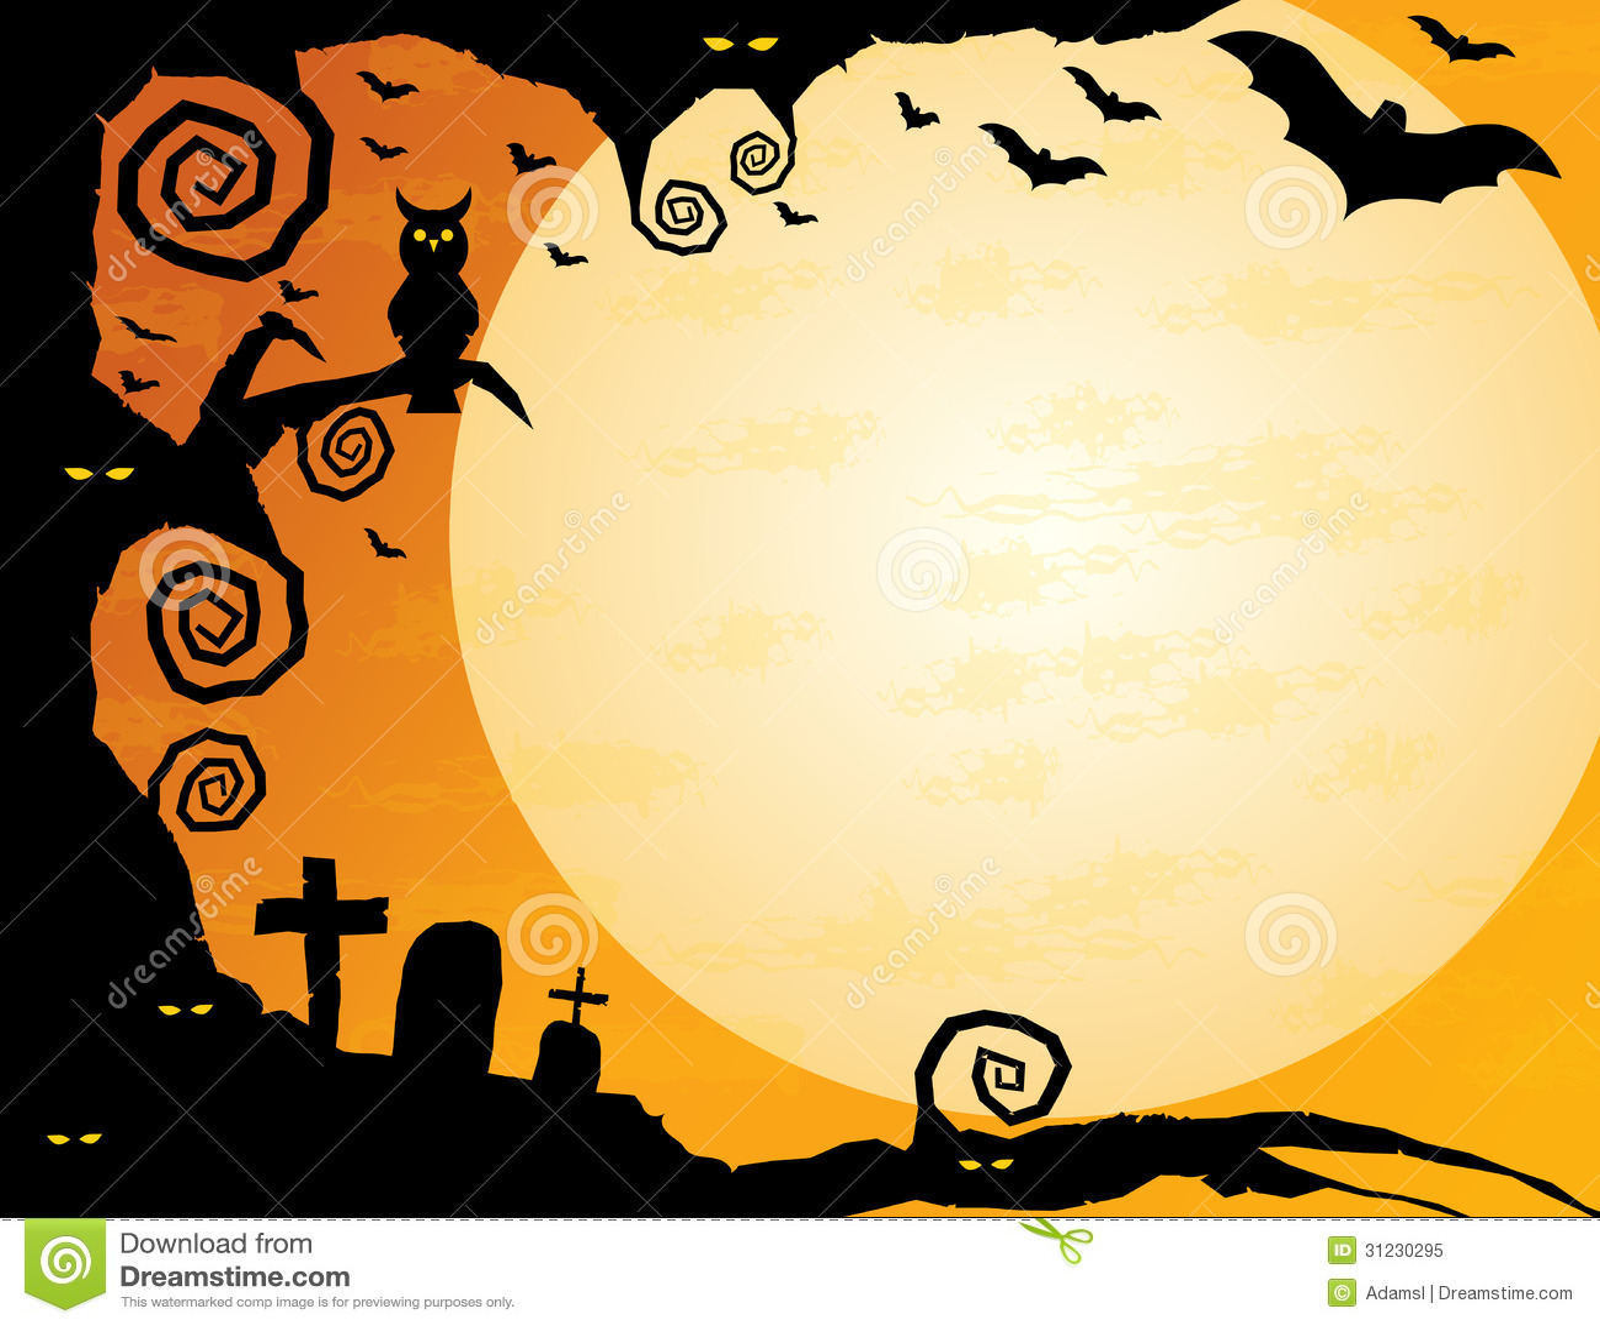 halloween background stock vector illustration of cartoon 31230295 rh dreamstime com Scary Eyes Evil Eyes Clip Art